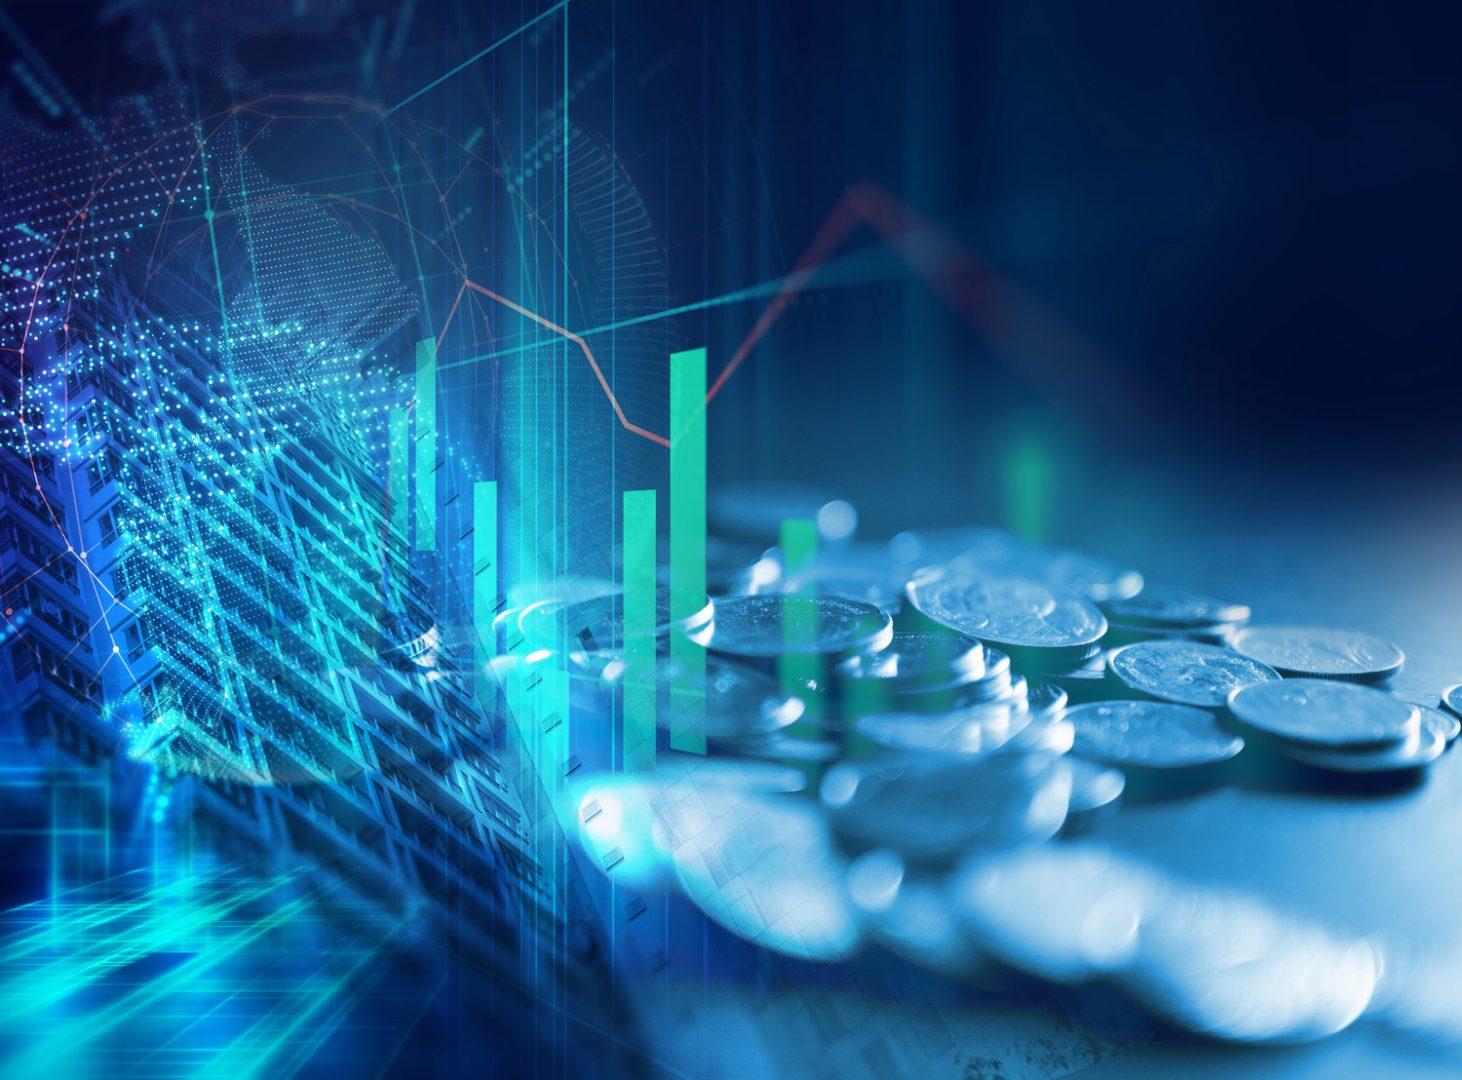 China's digital economy reaches 35.8 trln yuan in 2019